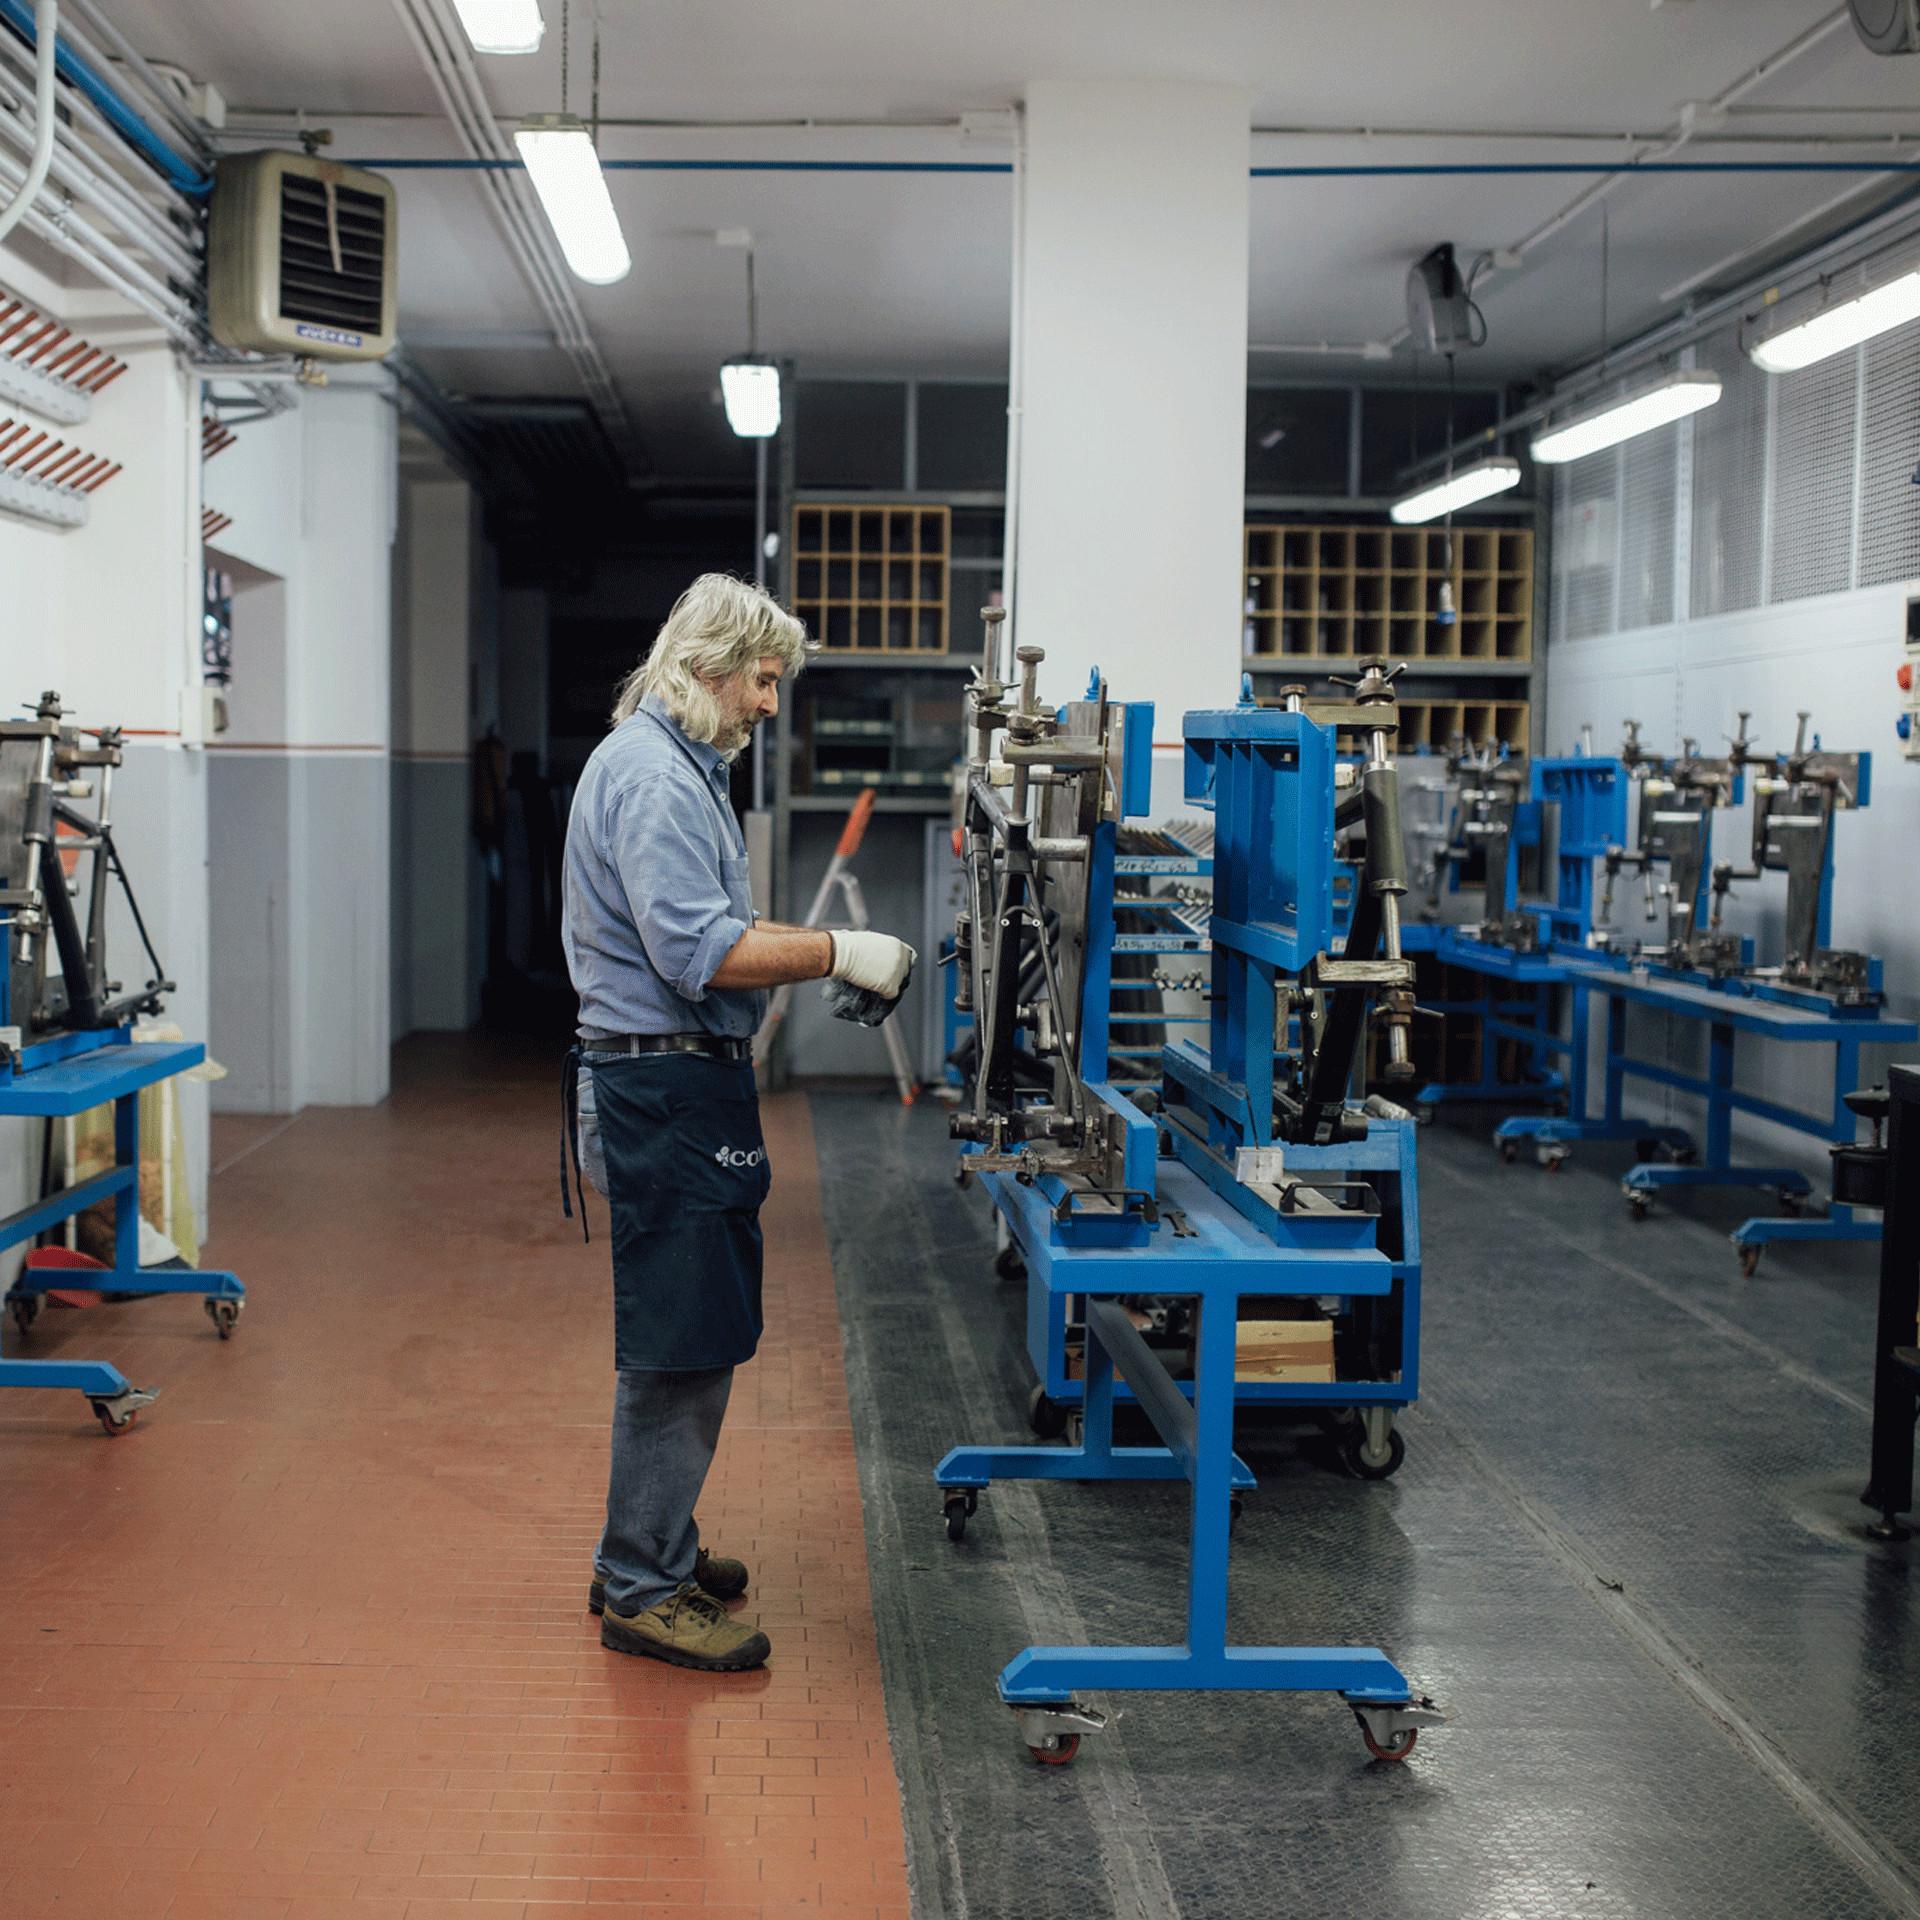 Colnago factory